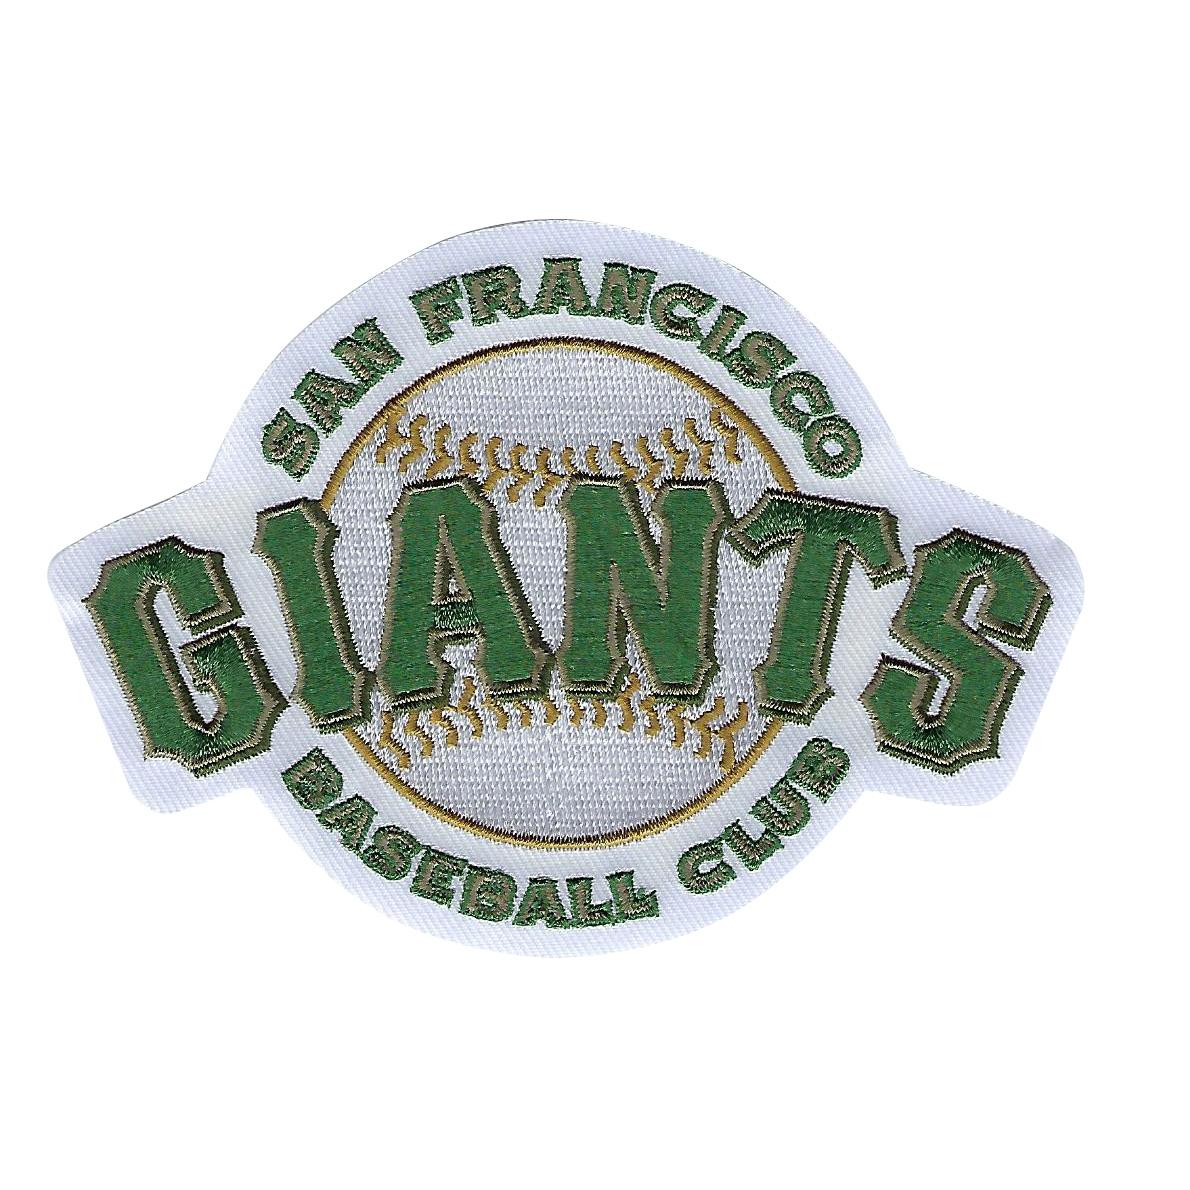 San Francisco Giants 2018 Memorial Day USMC Logo Patch - No Size